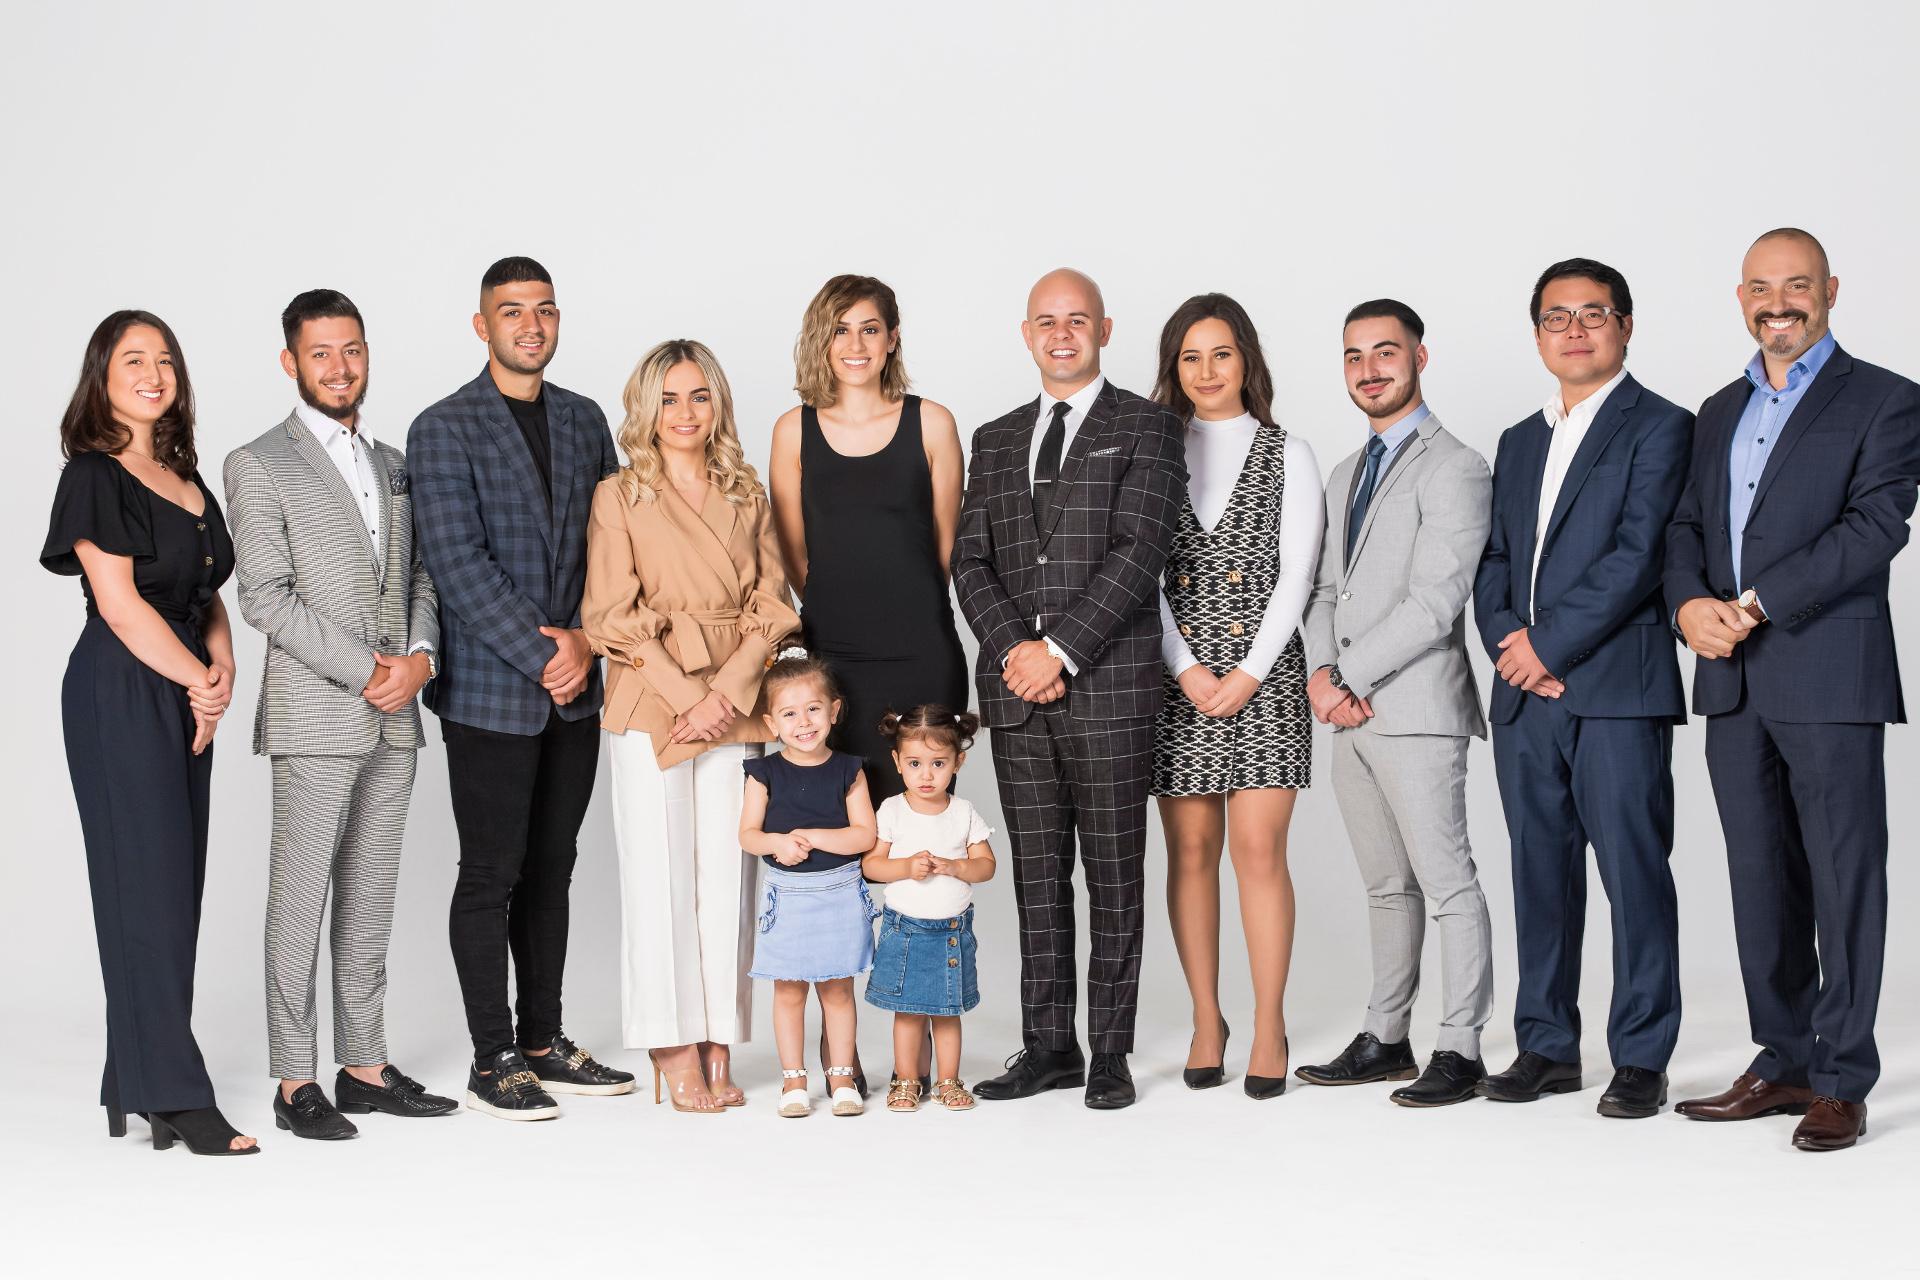 The Realest Estate Team Photo